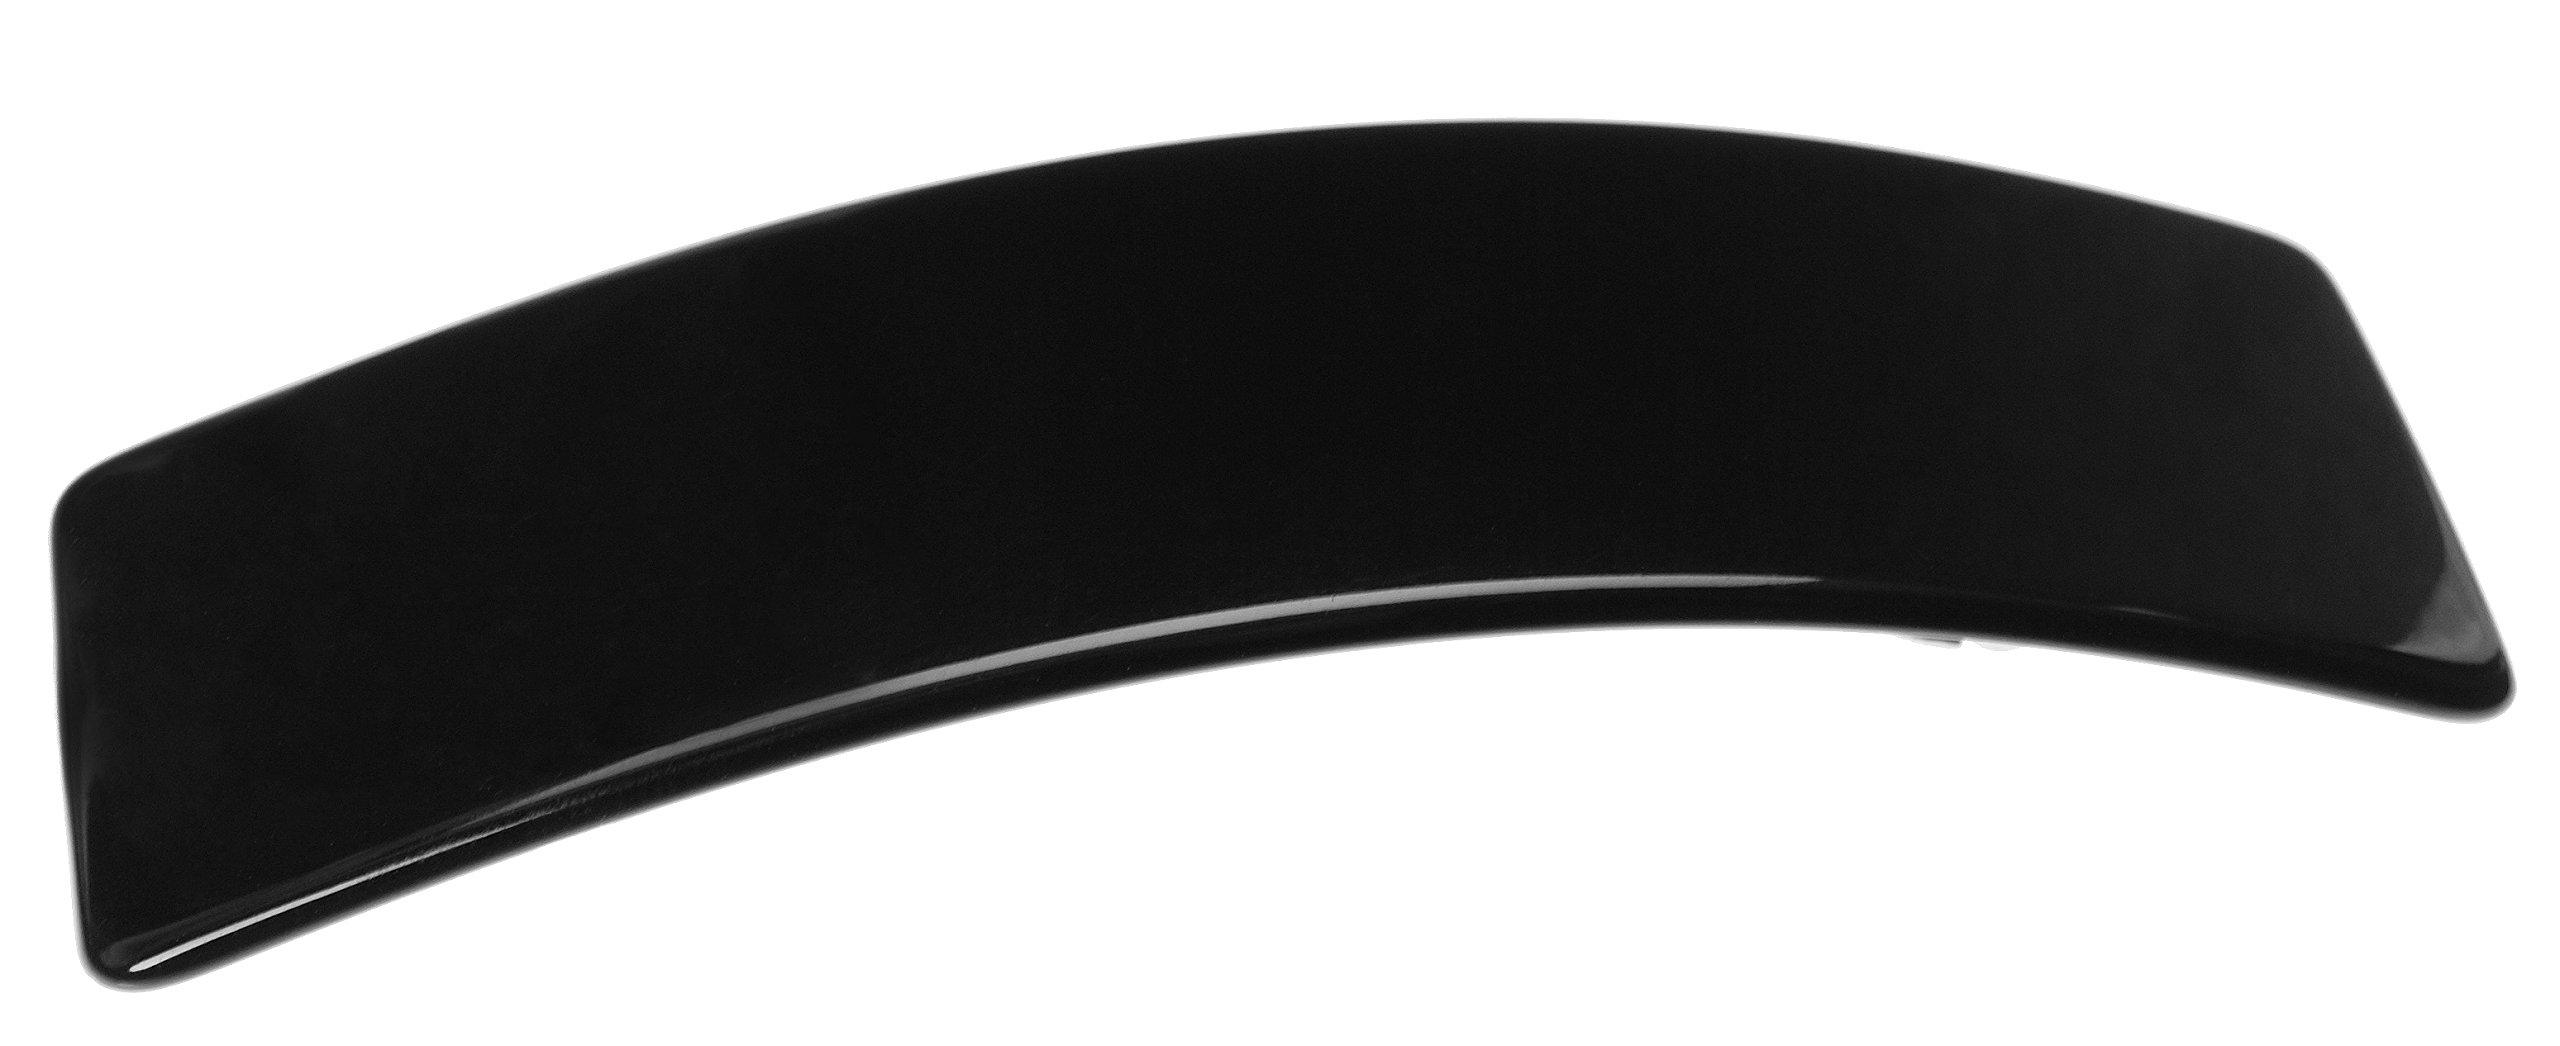 France Luxe Large Rectangle Barrette - Black